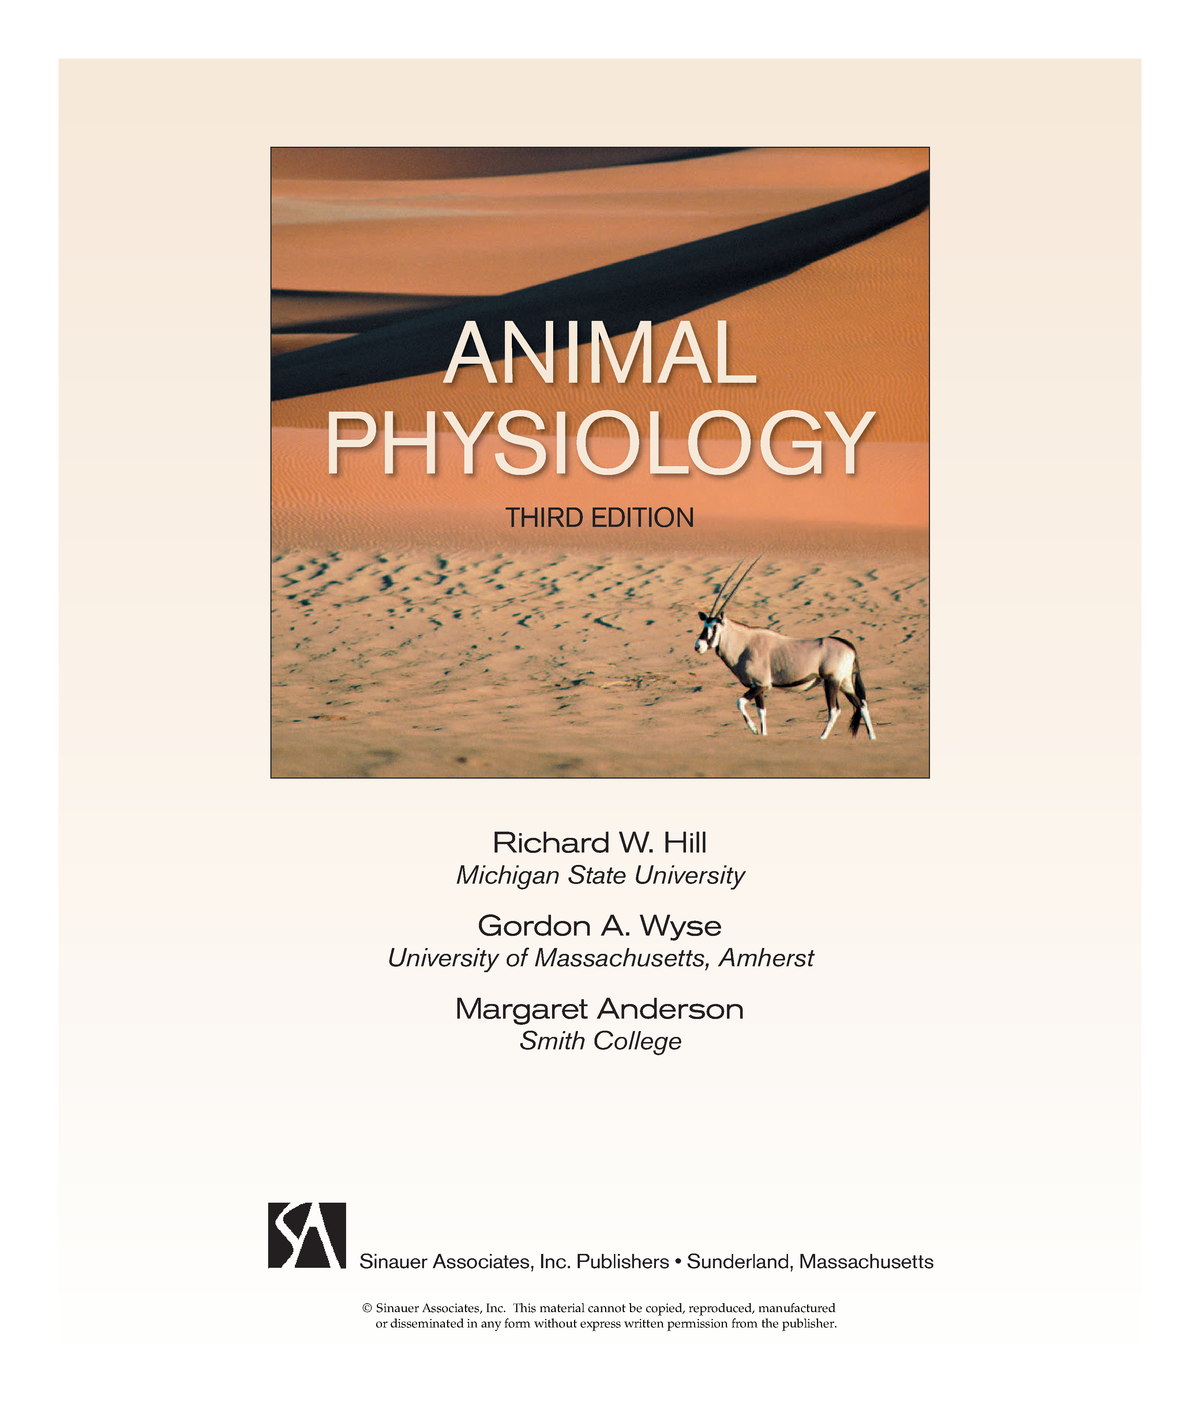 Animal Physiology 3 - StuDocu